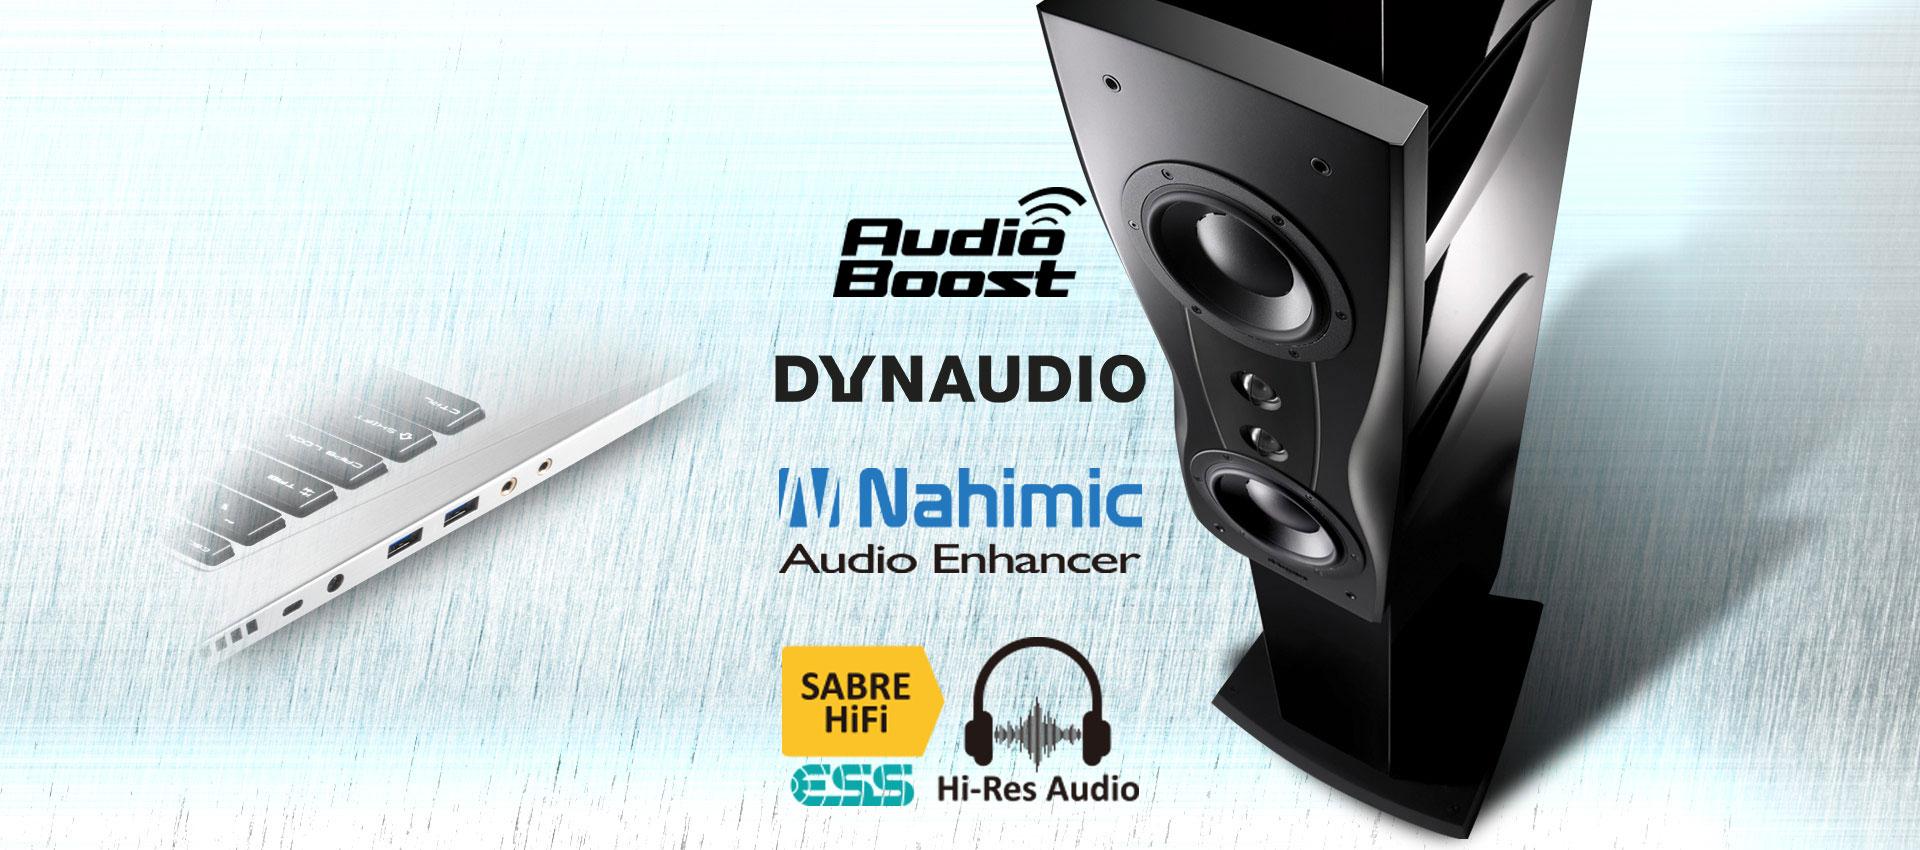 MSI PE60 6QD Nahimic, Dynaudio, Audio Boost